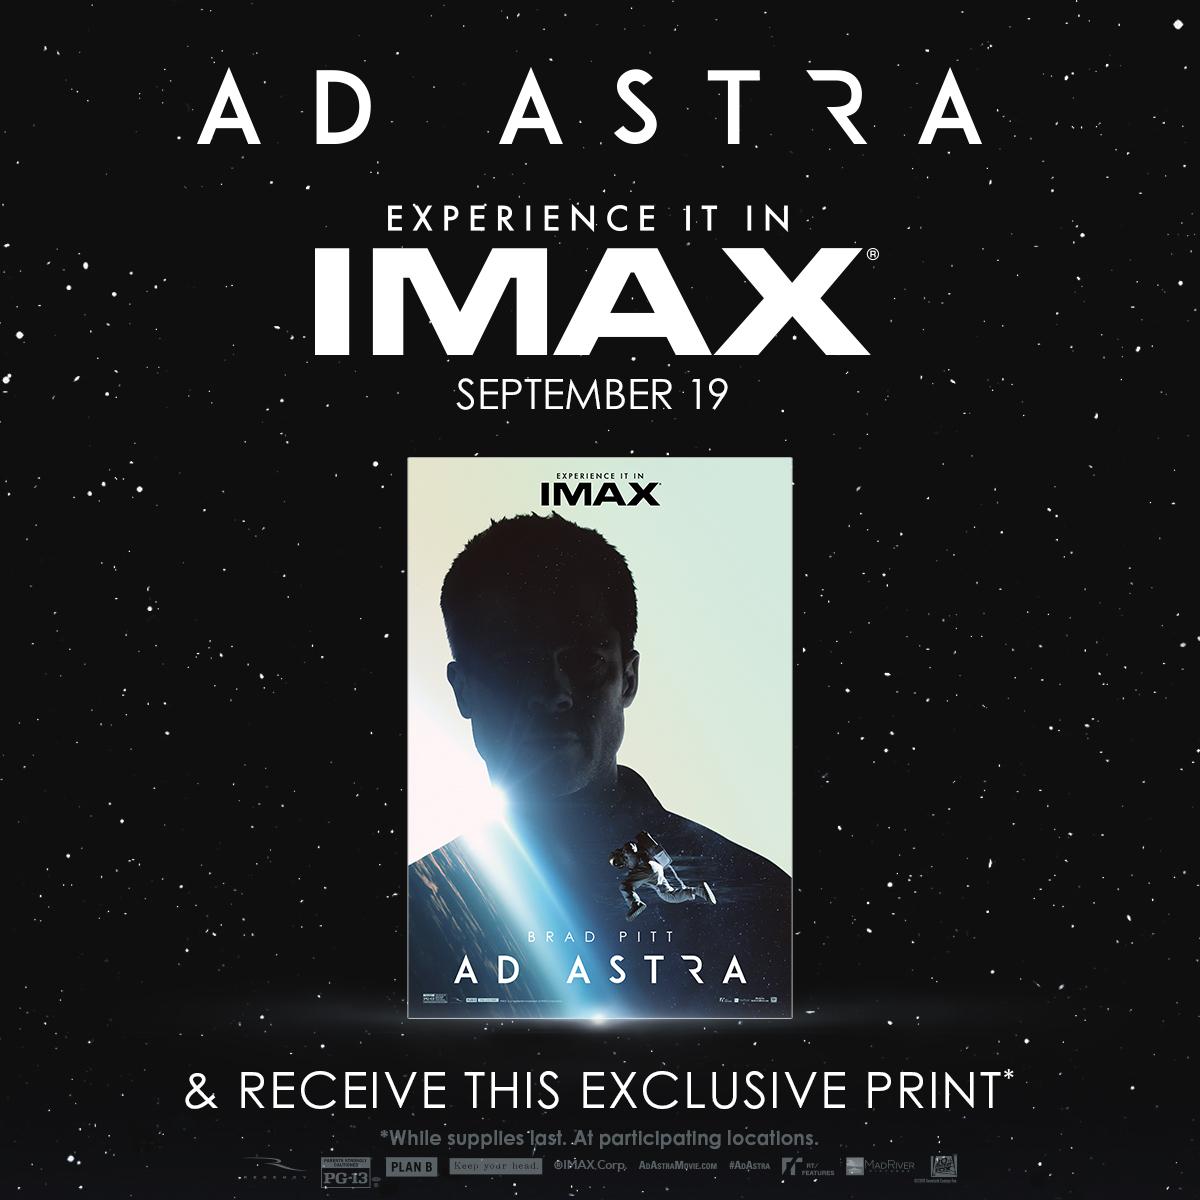 Exclusive Print Giveaway